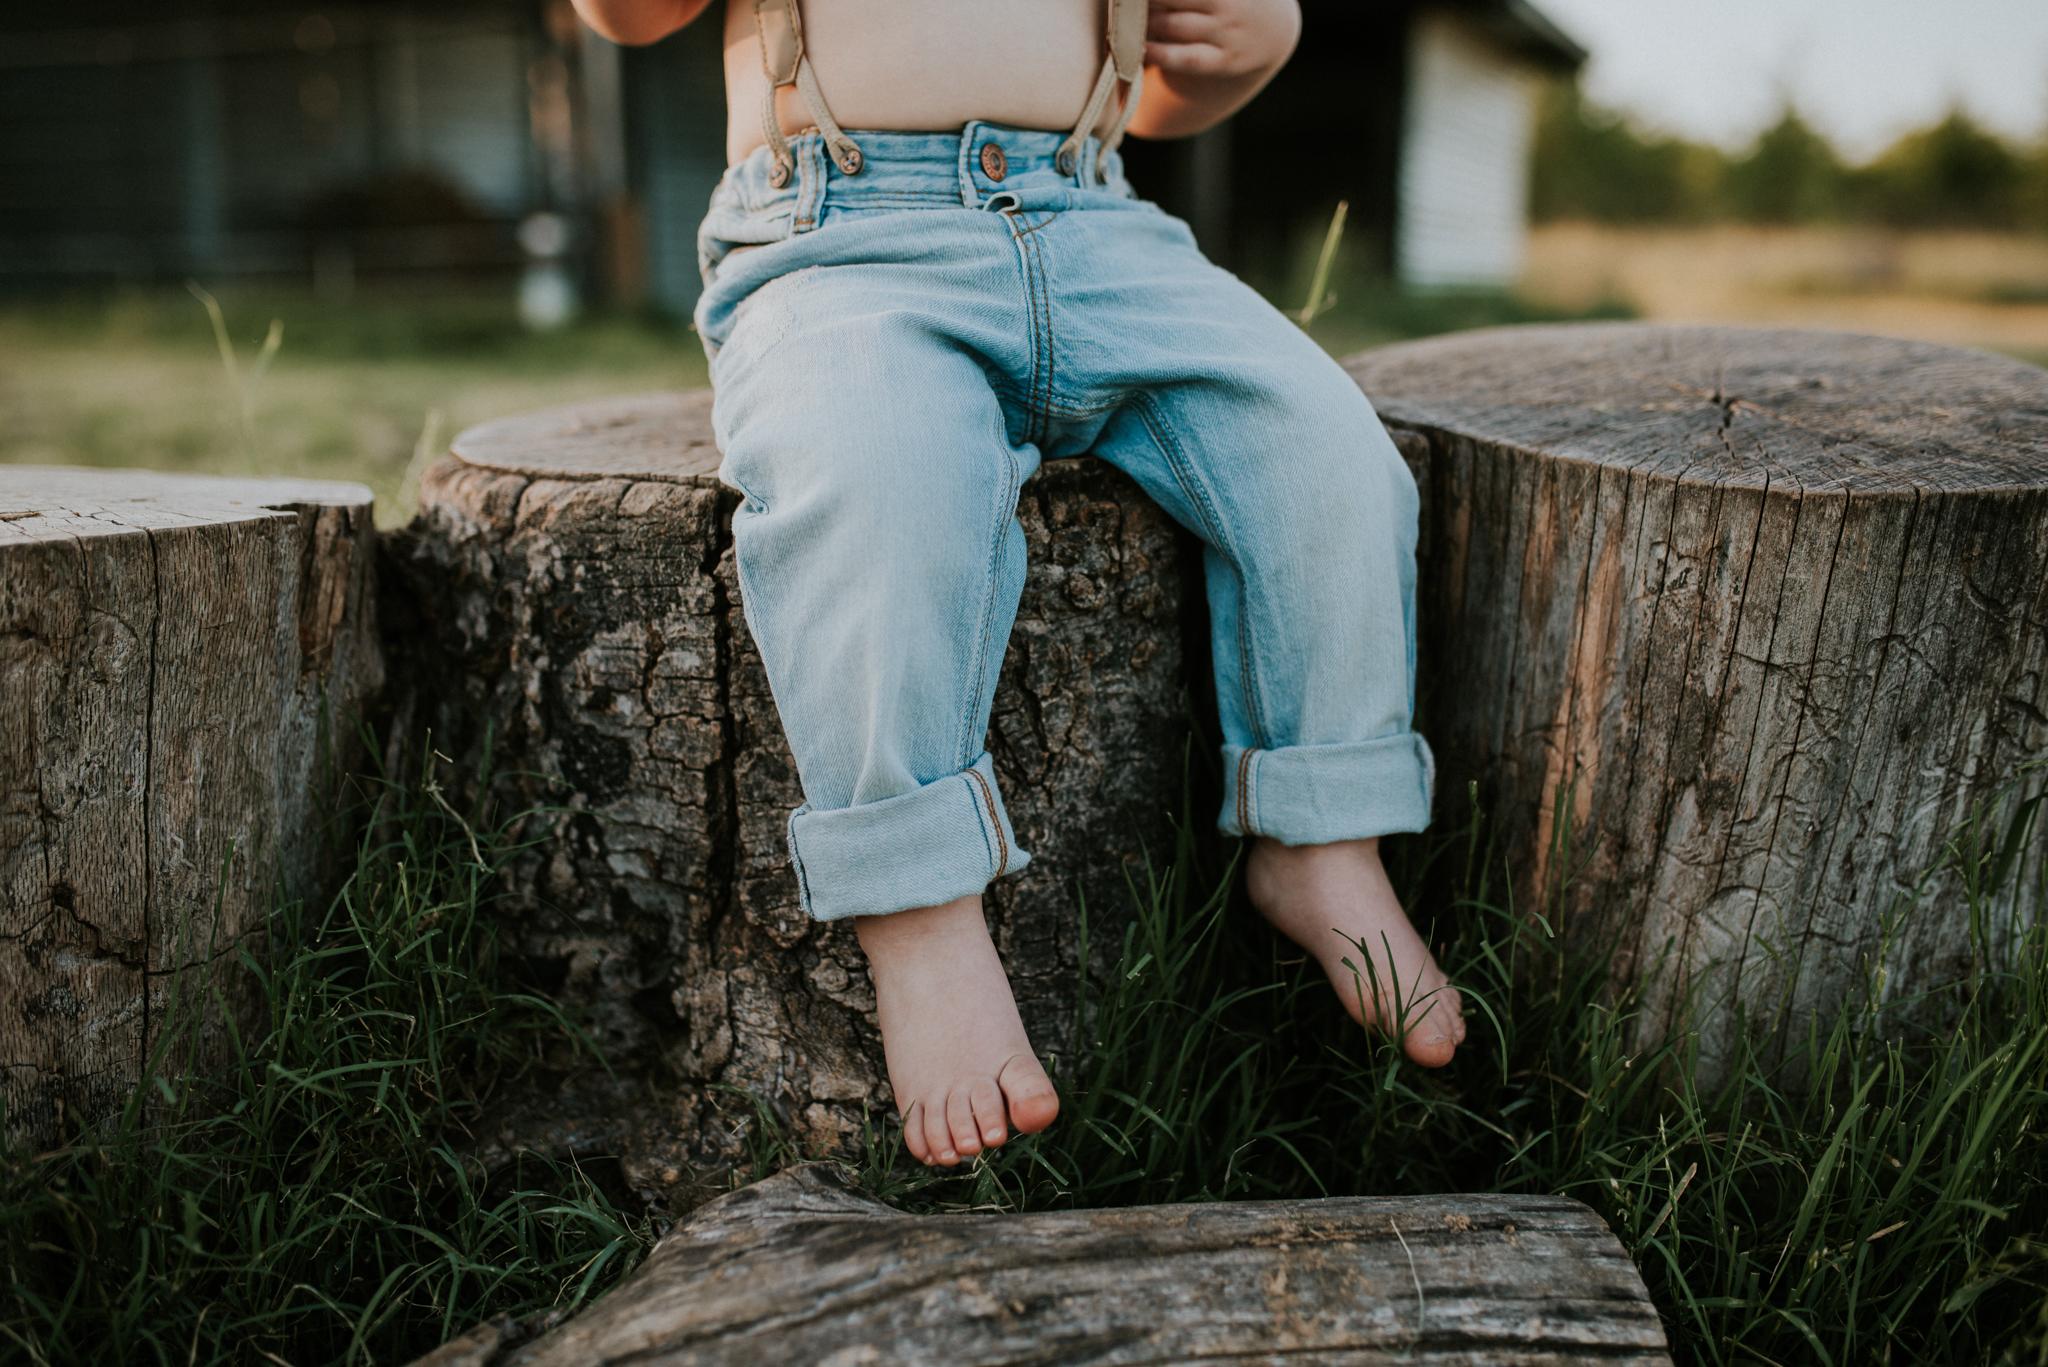 Graham-18 months-41.jpg